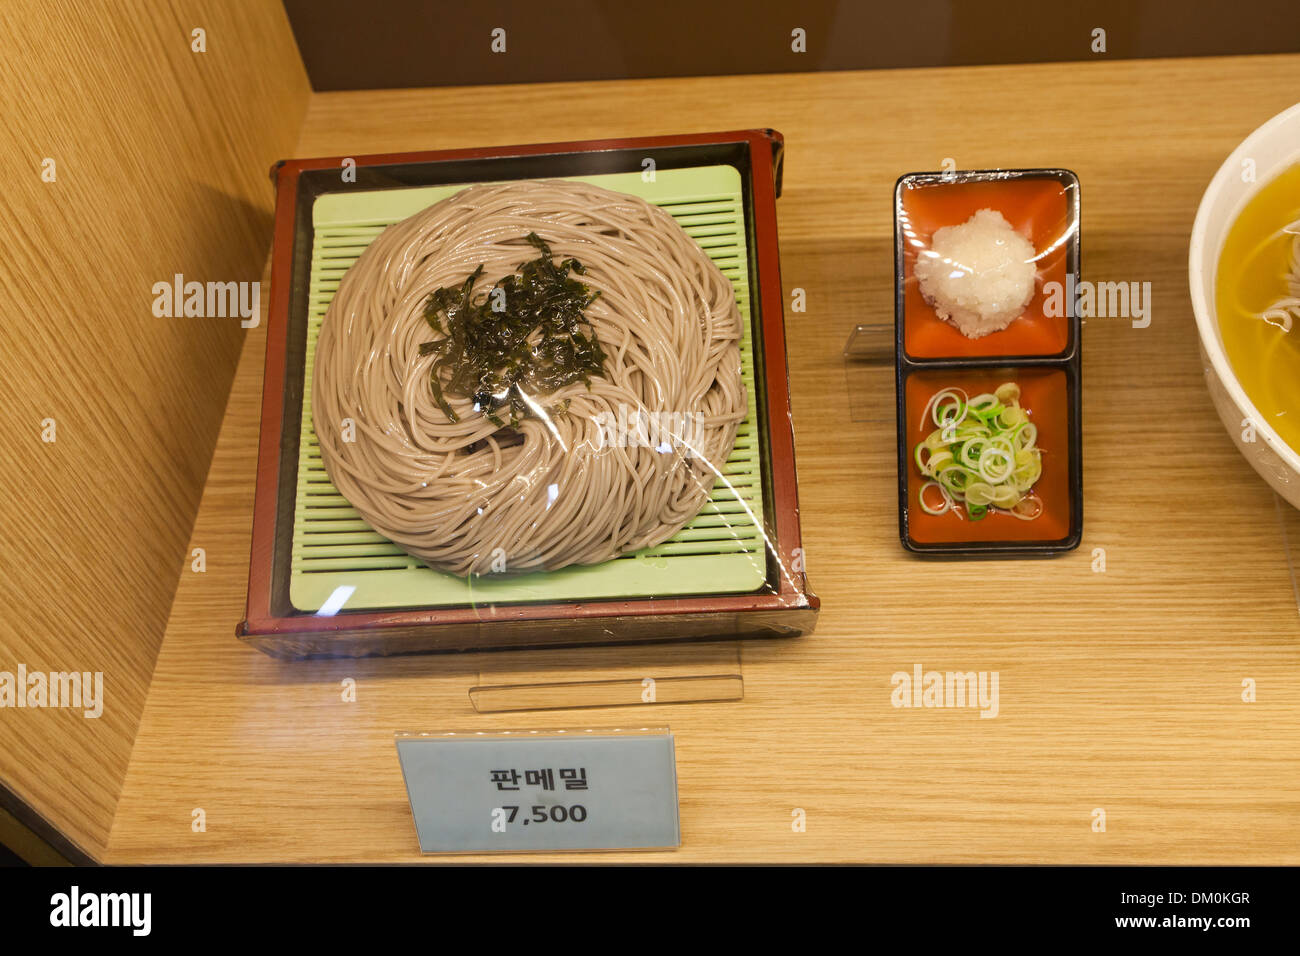 Plastic food  model (buckwheat noodles) display case at fast food restaurant - Seoul, South Korea - Stock Image